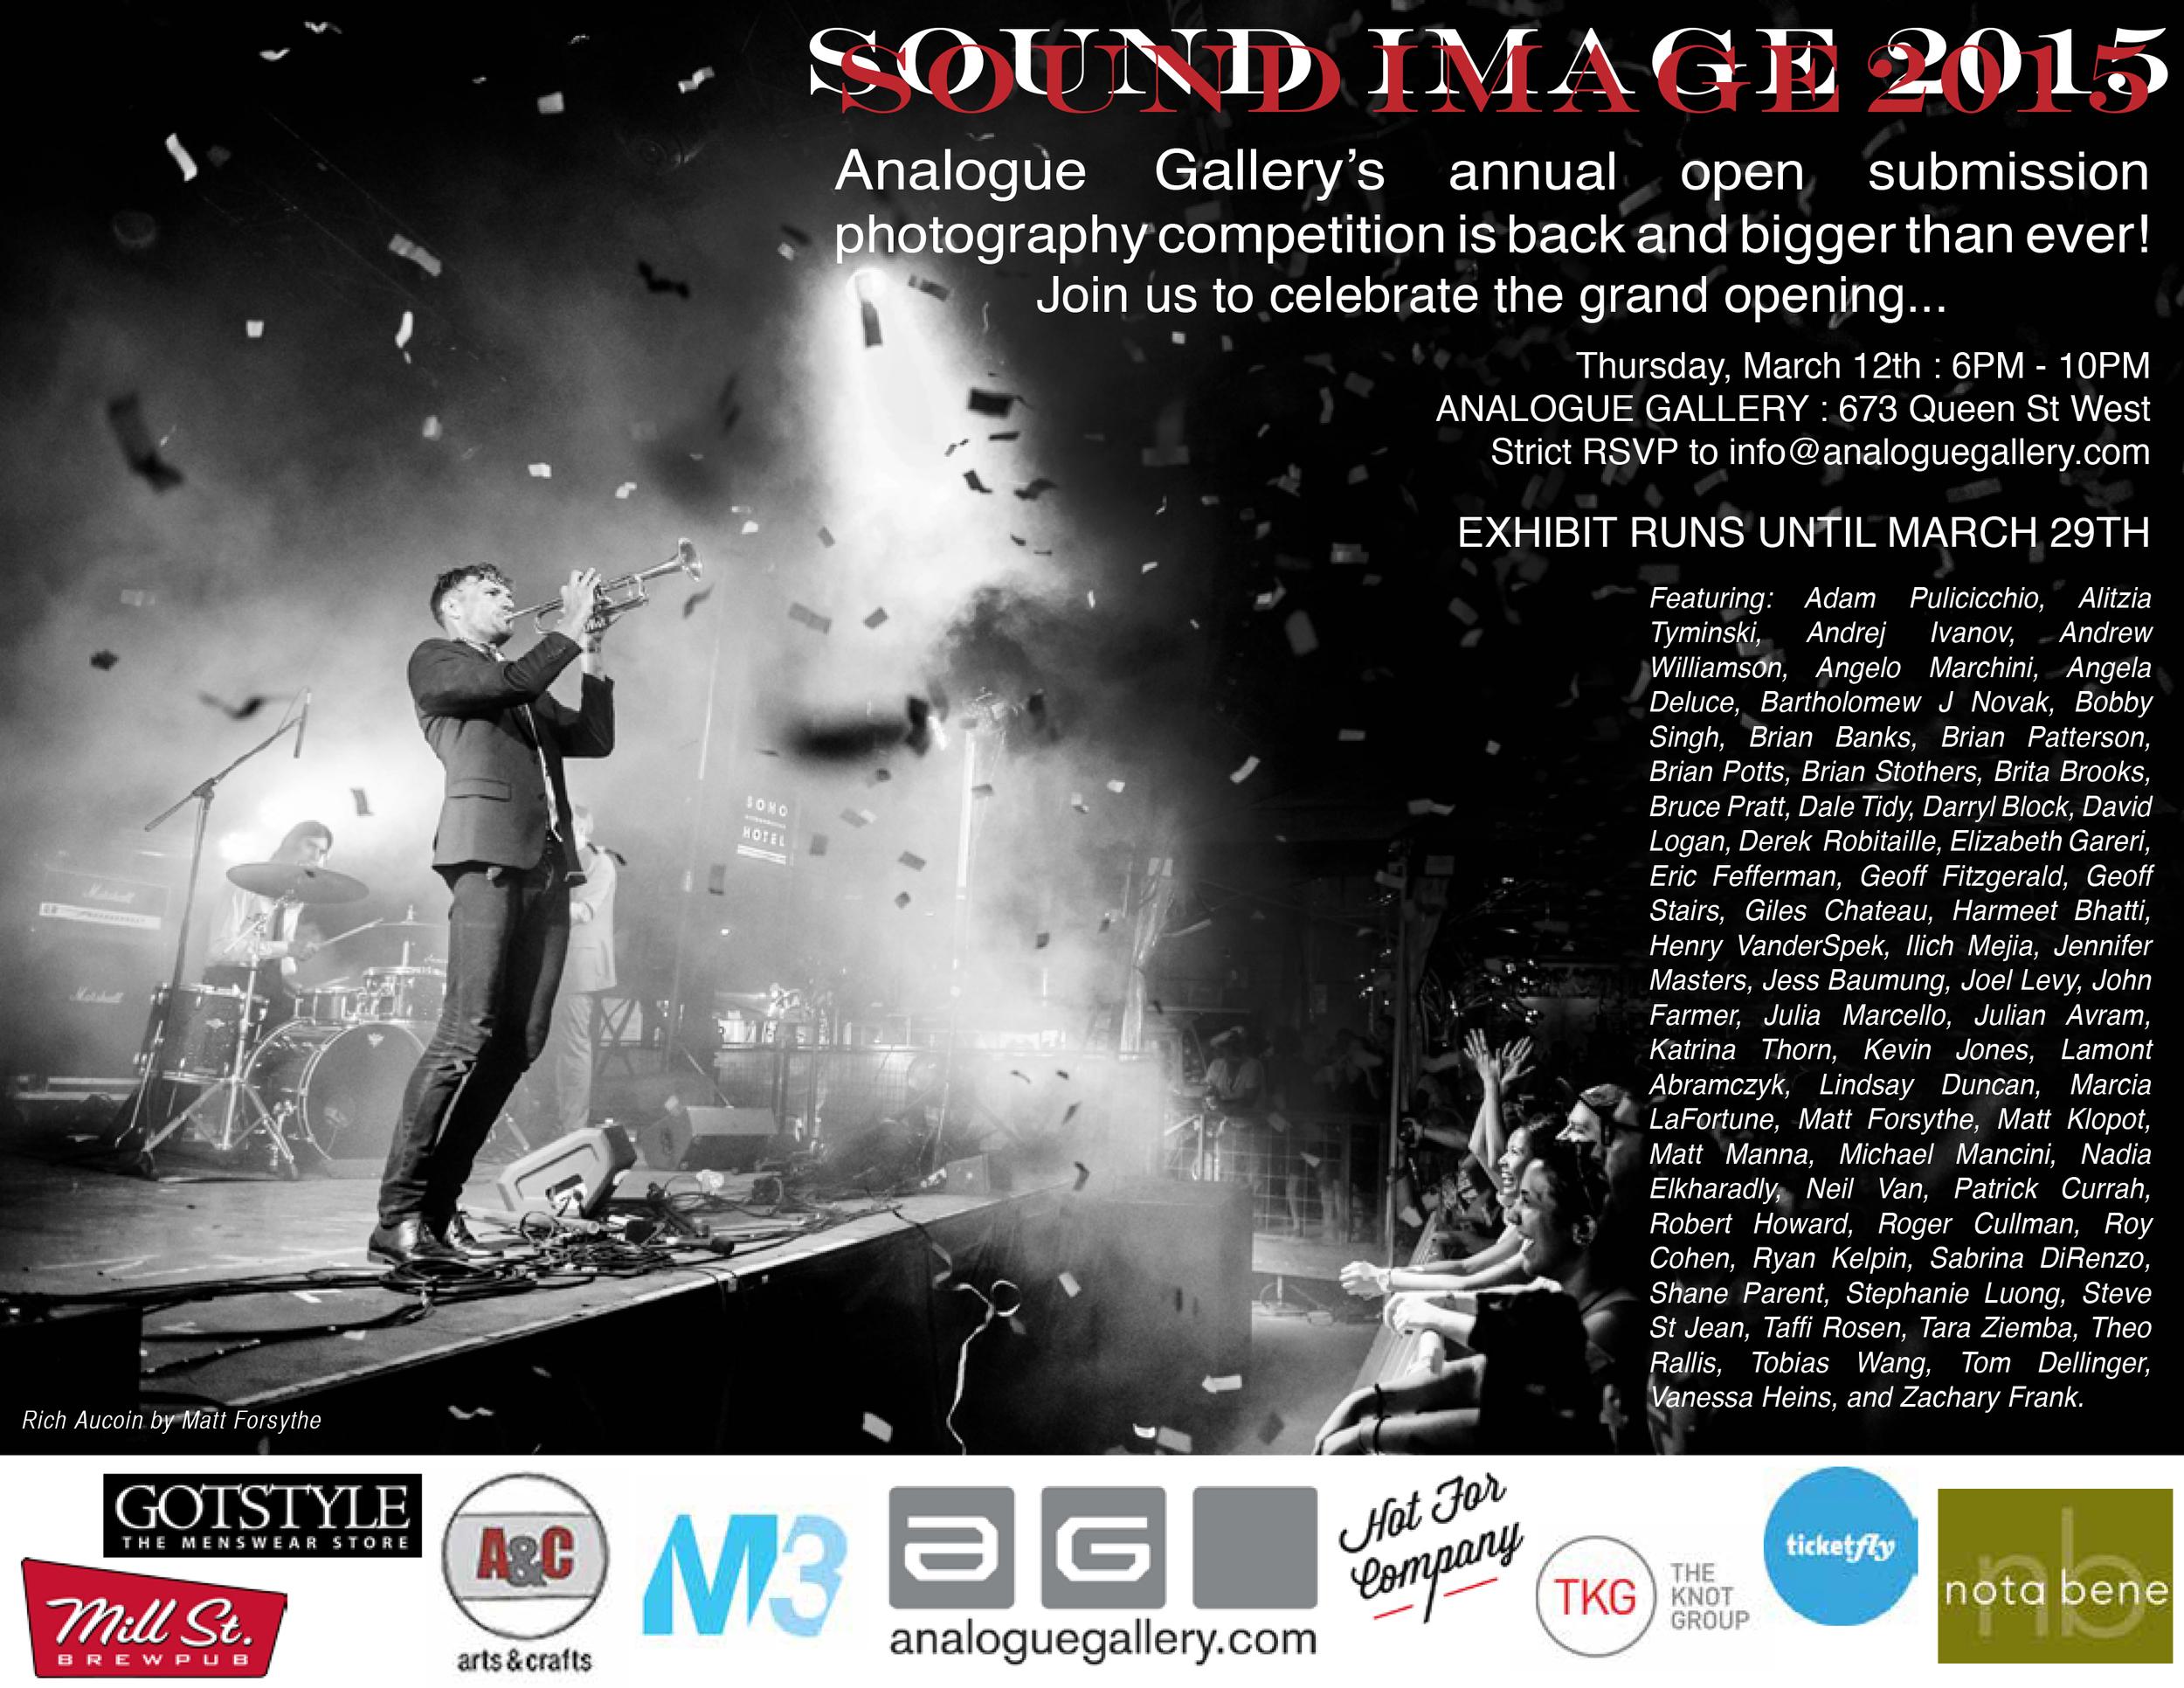 SOUND IMAGE 2015 INVITE.jpg